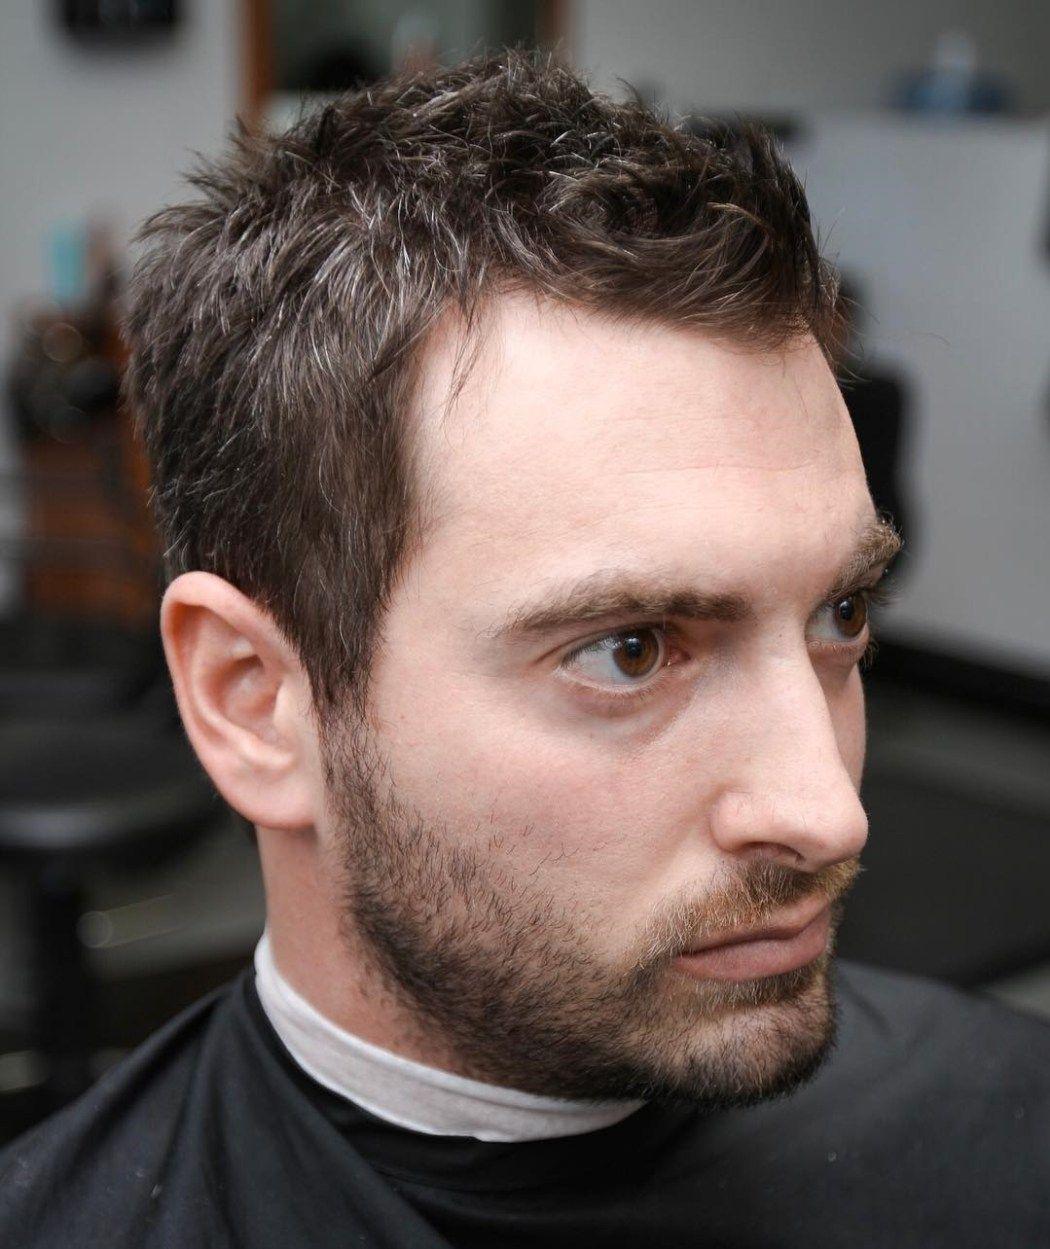 Short haircuts for balding men  classy haircuts and hairstyles for balding men  menus hair